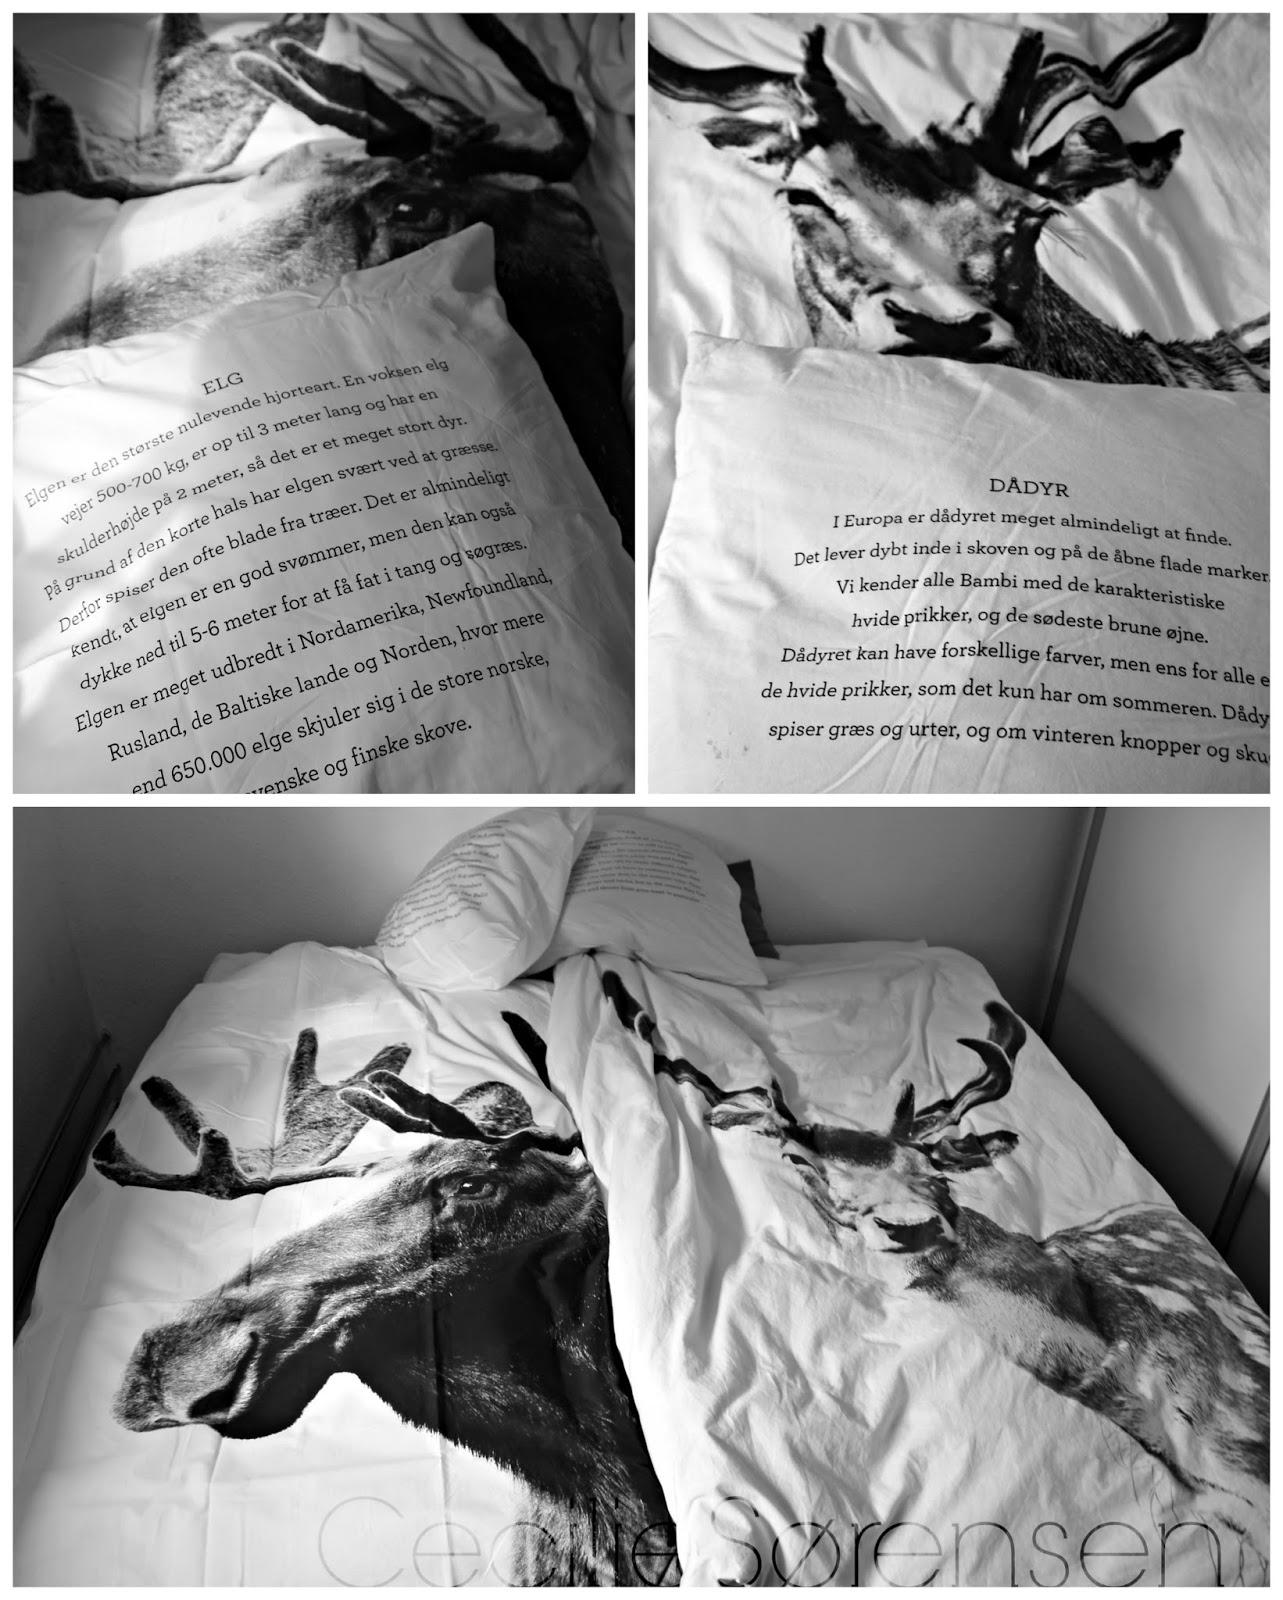 føtex sengetøj Glimmer skuffen: By Nord sengetøj føtex sengetøj